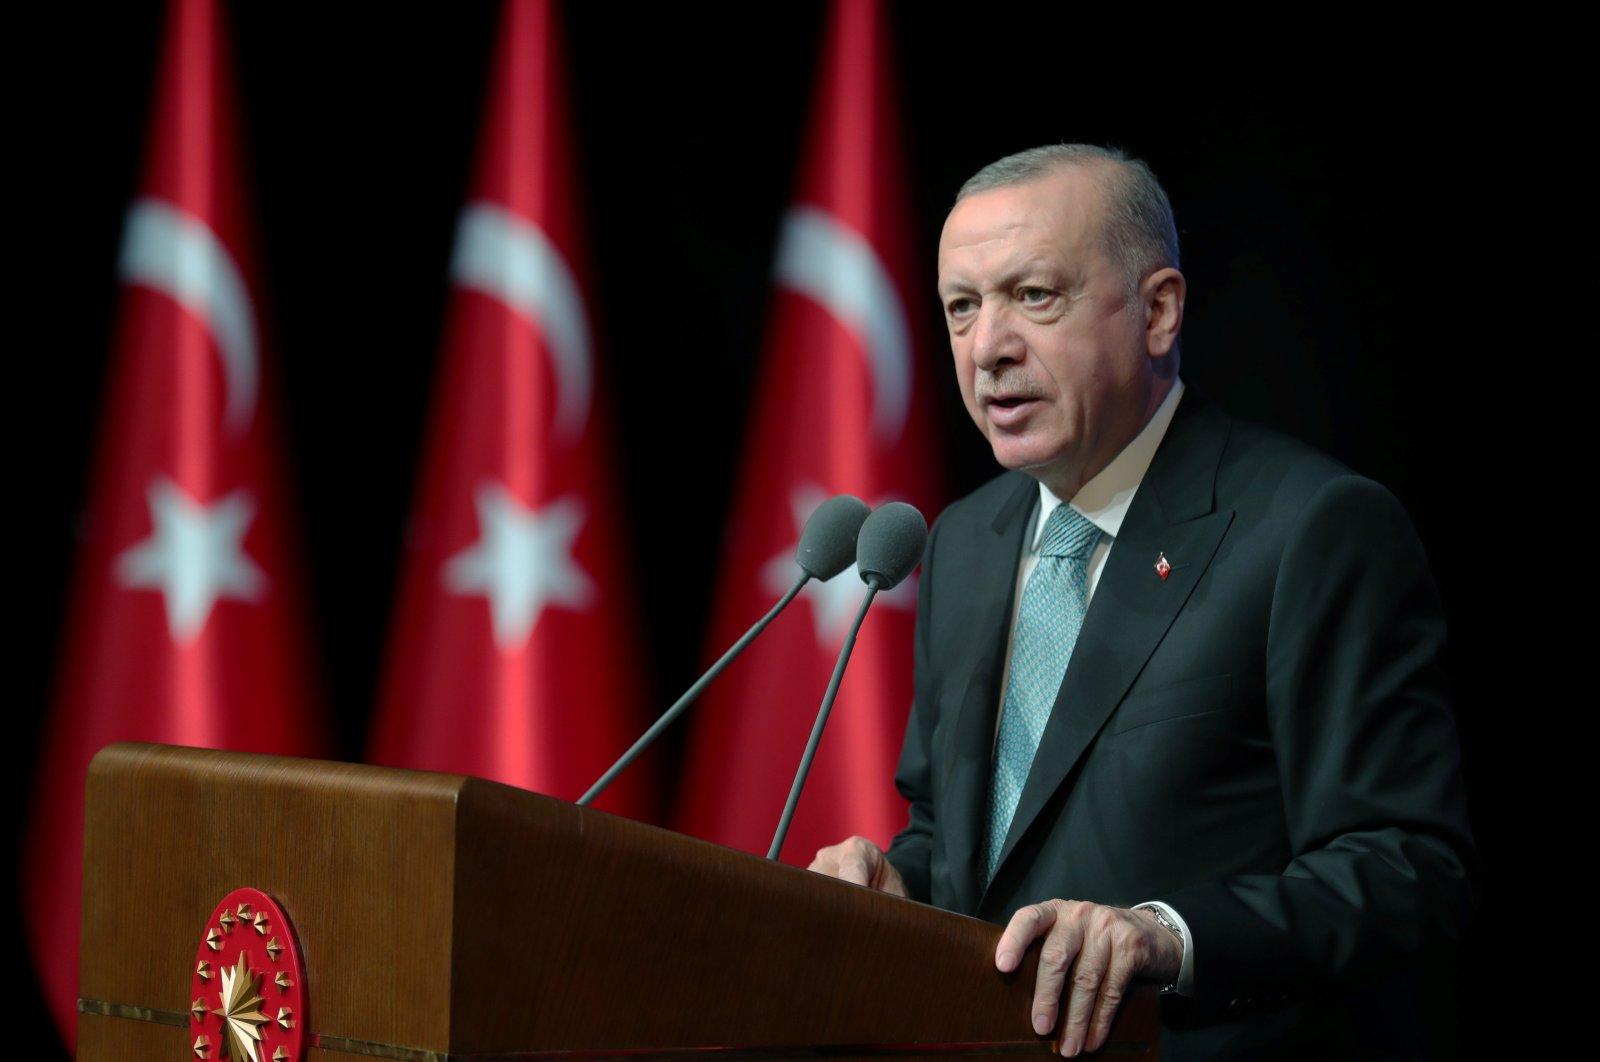 President Tayyip Erdoğan speaks during an action plan meeting to prevent violence against women, in Ankara, Turkey, July 1, 2021. (Presidential Press Office Handout via Reuters)